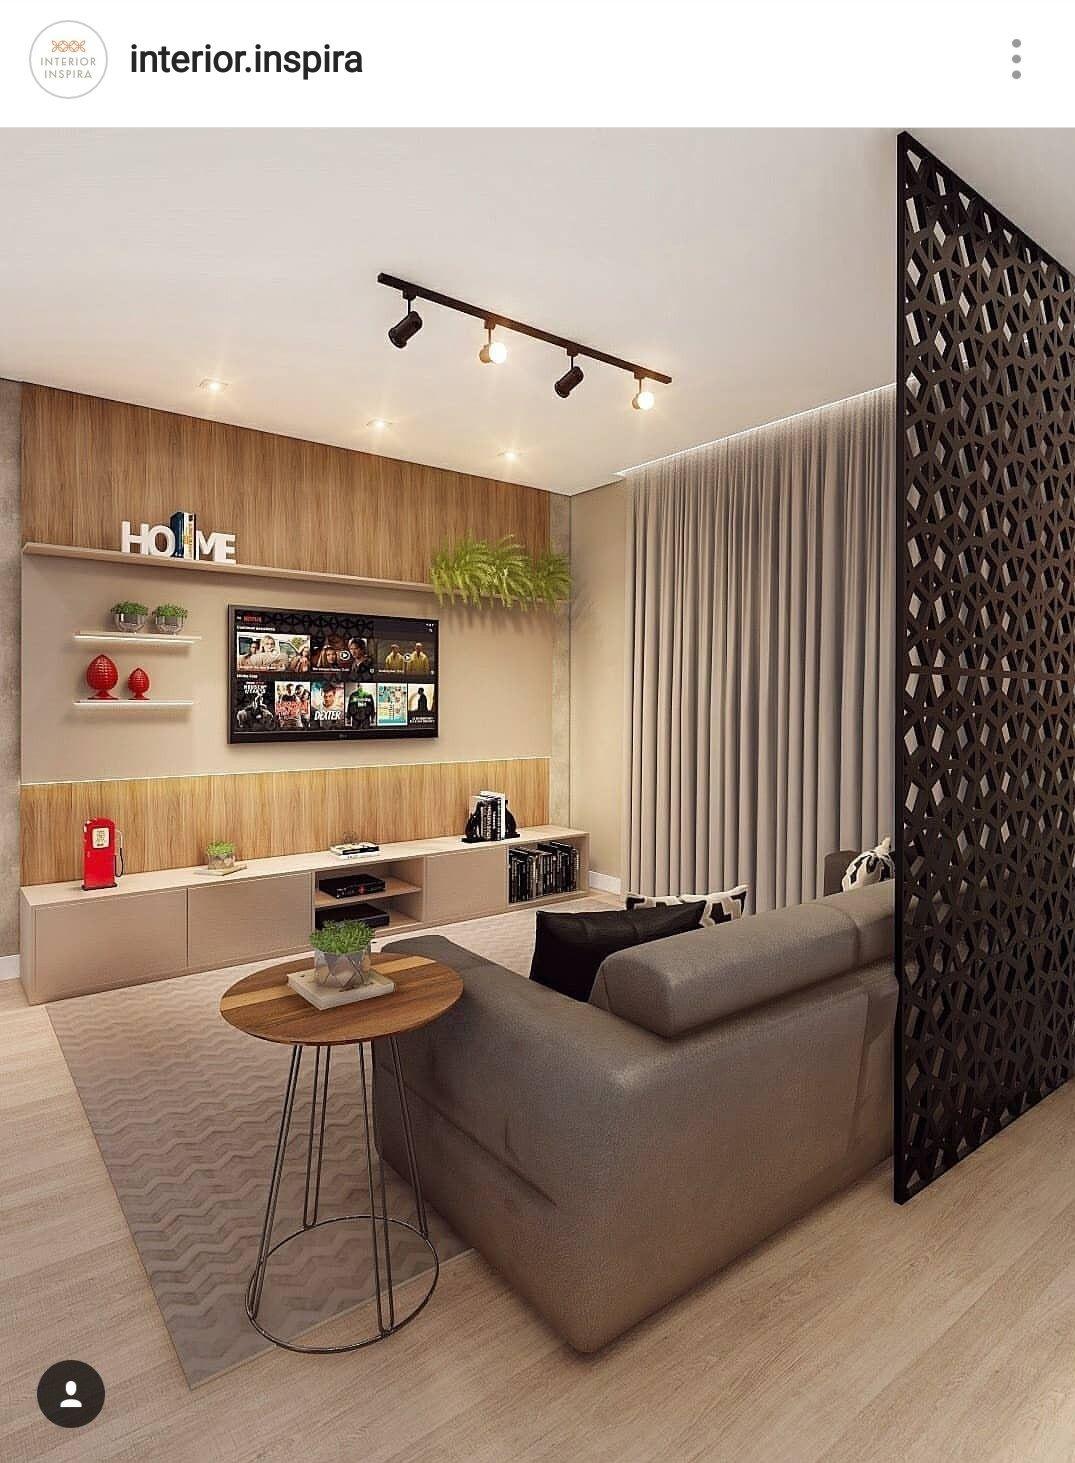 Pin de adrianna murillo castillo en decoraciones de for Lamparas para apartamentos pequenos